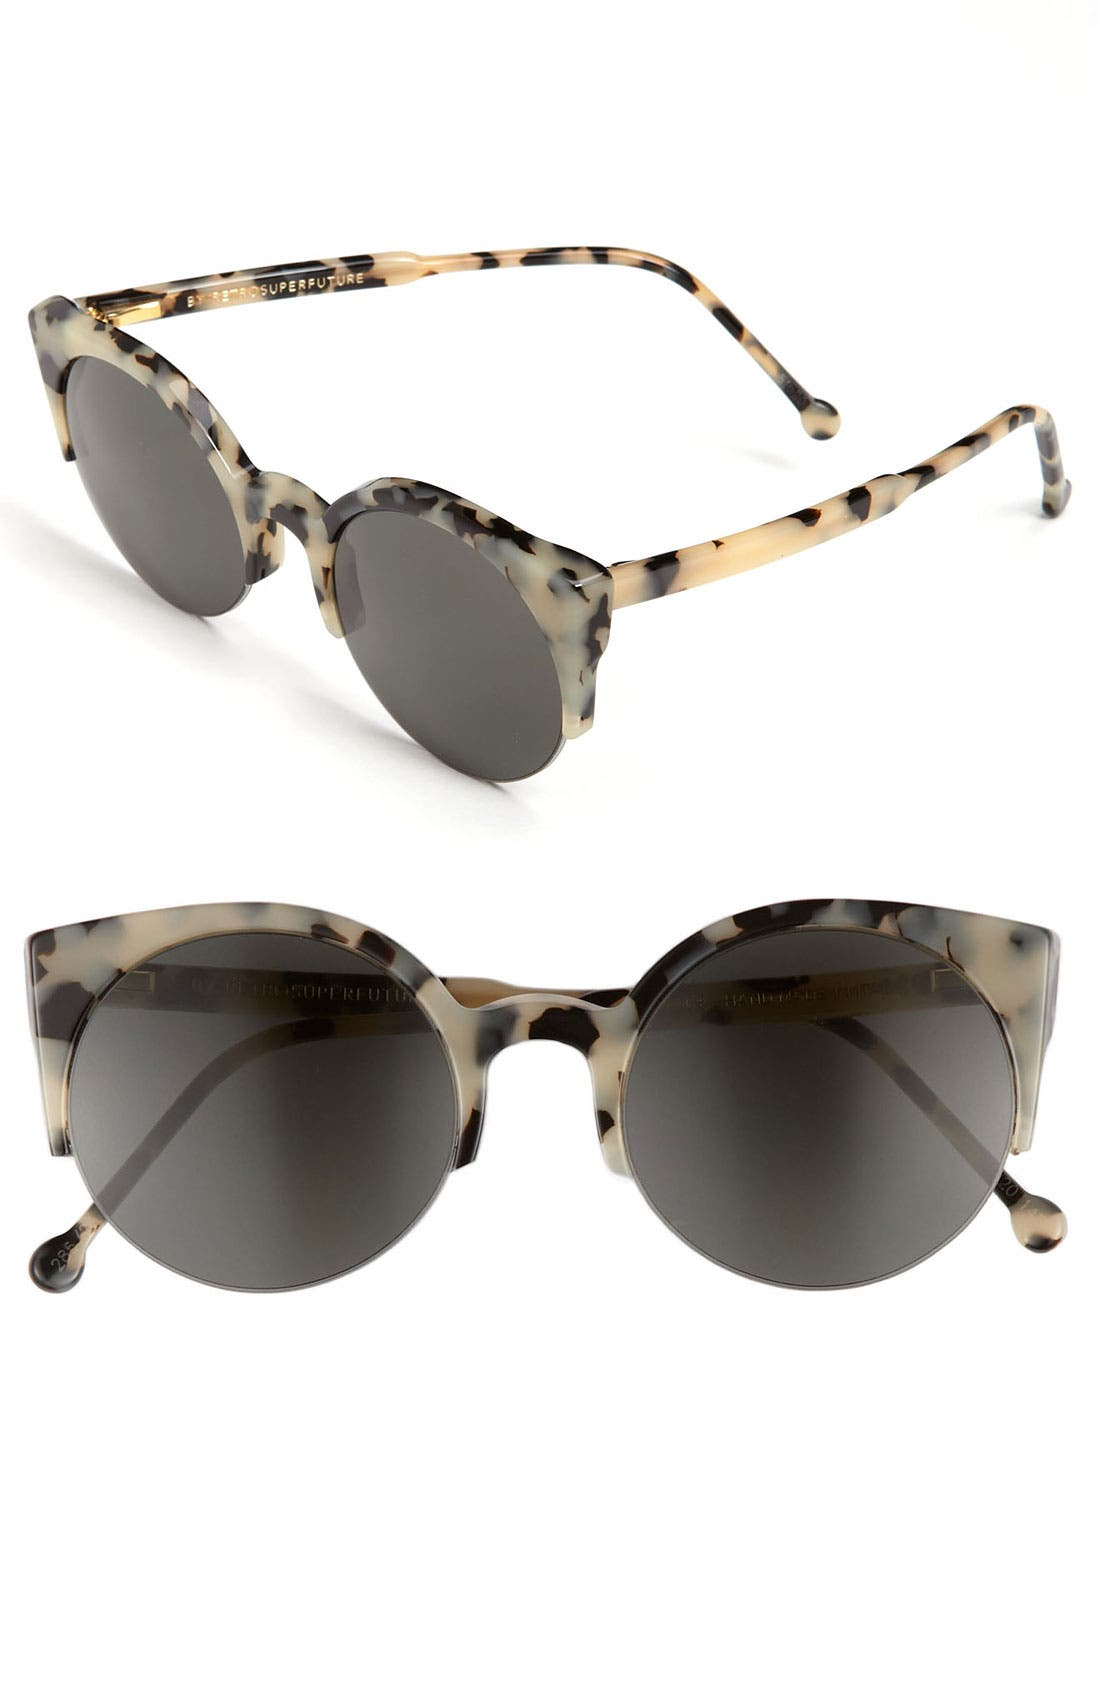 Main Image - SUPER by RETROSUPERFUTURE® 'Lucia' 51mm Sunglasses